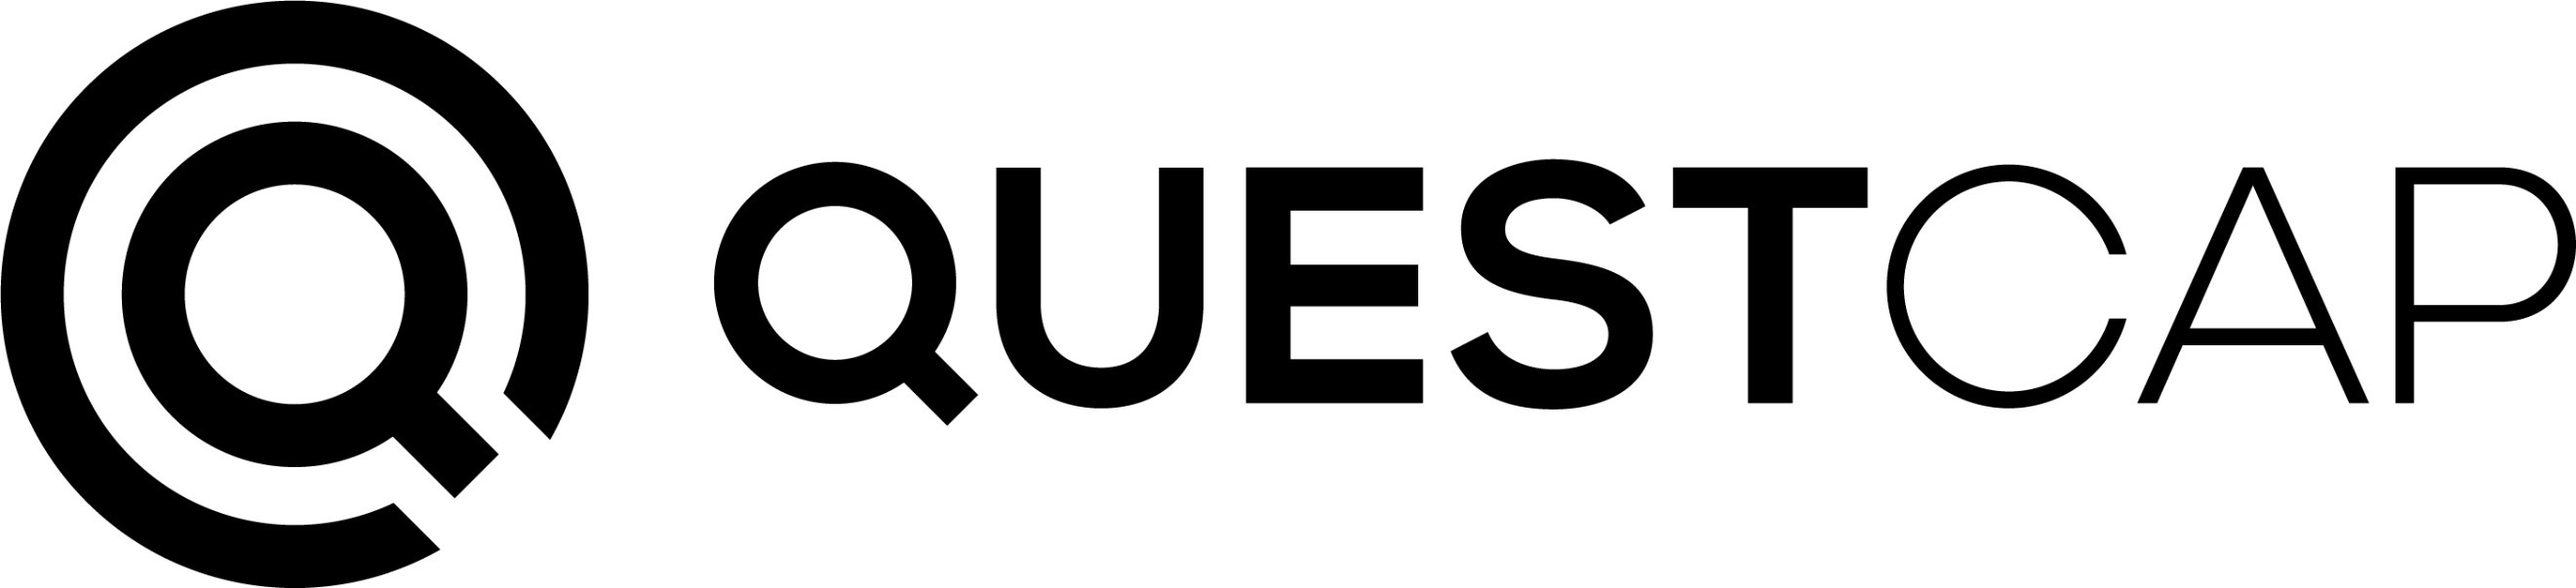 REPEAT - QuestCap Acquires 49% of Athletics and Health Solutions Inc.